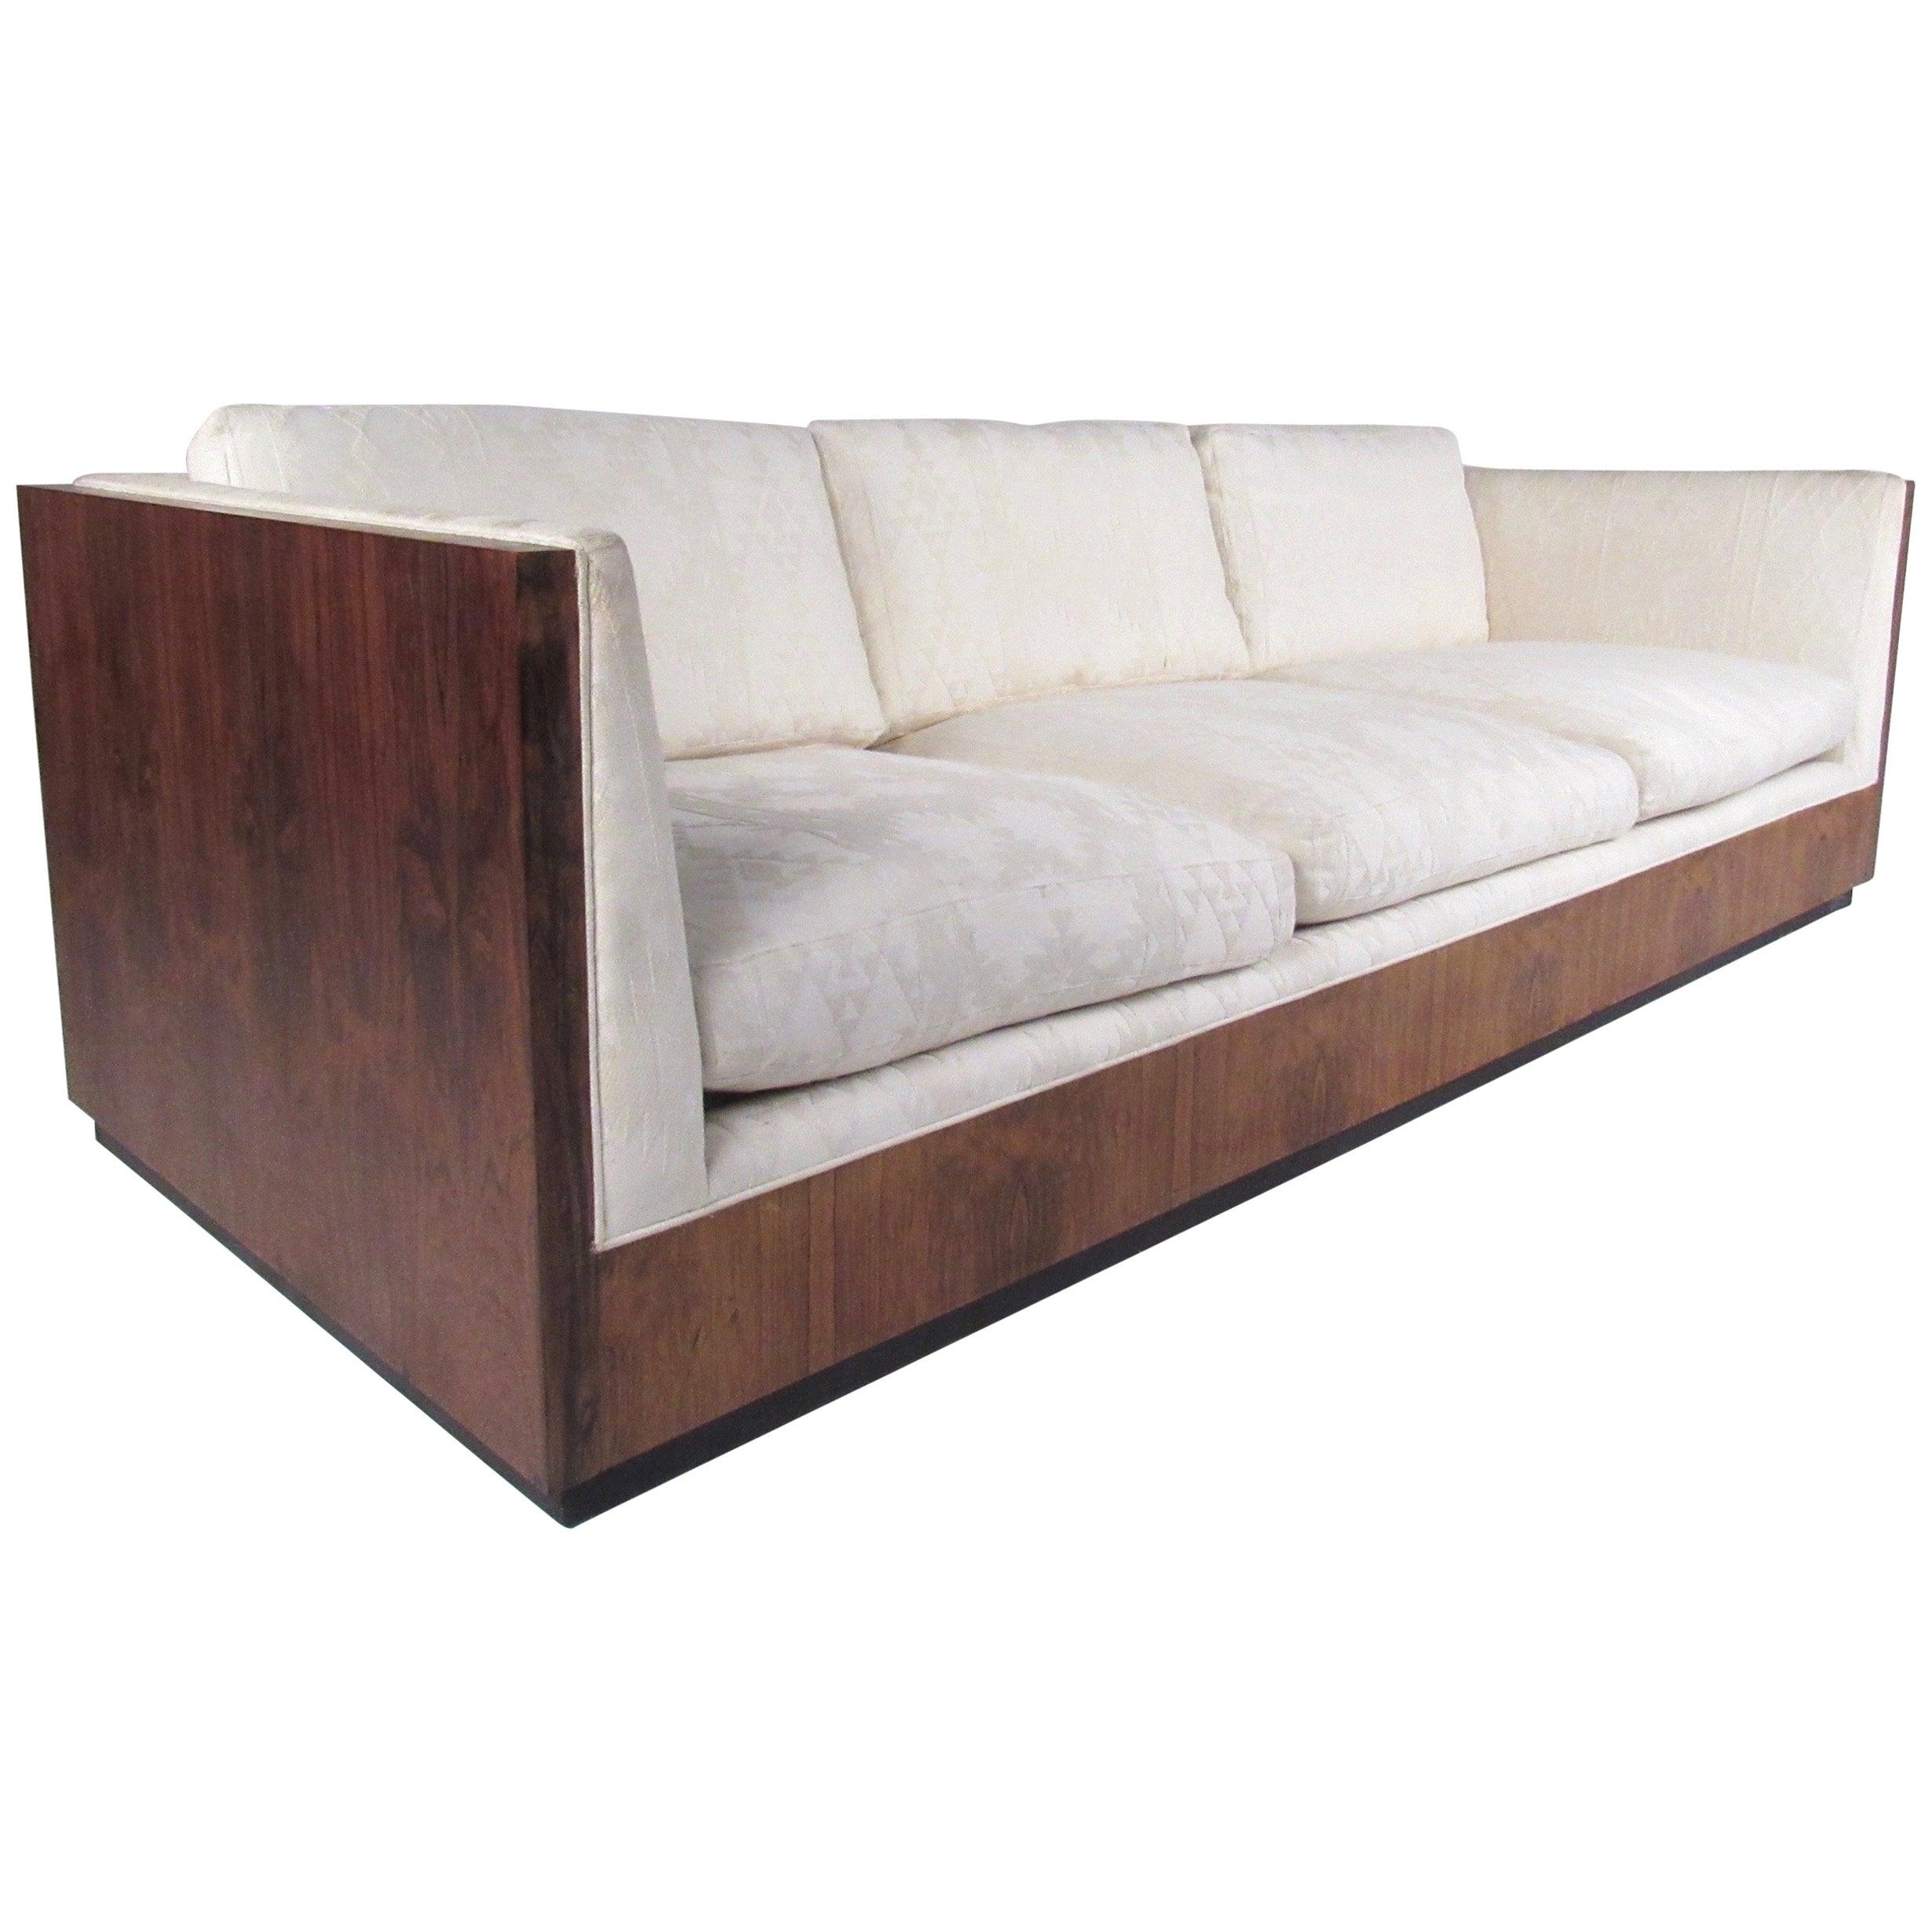 Vintage Milo Baughman Rosewood Frame Sofa for Thayer Coggin